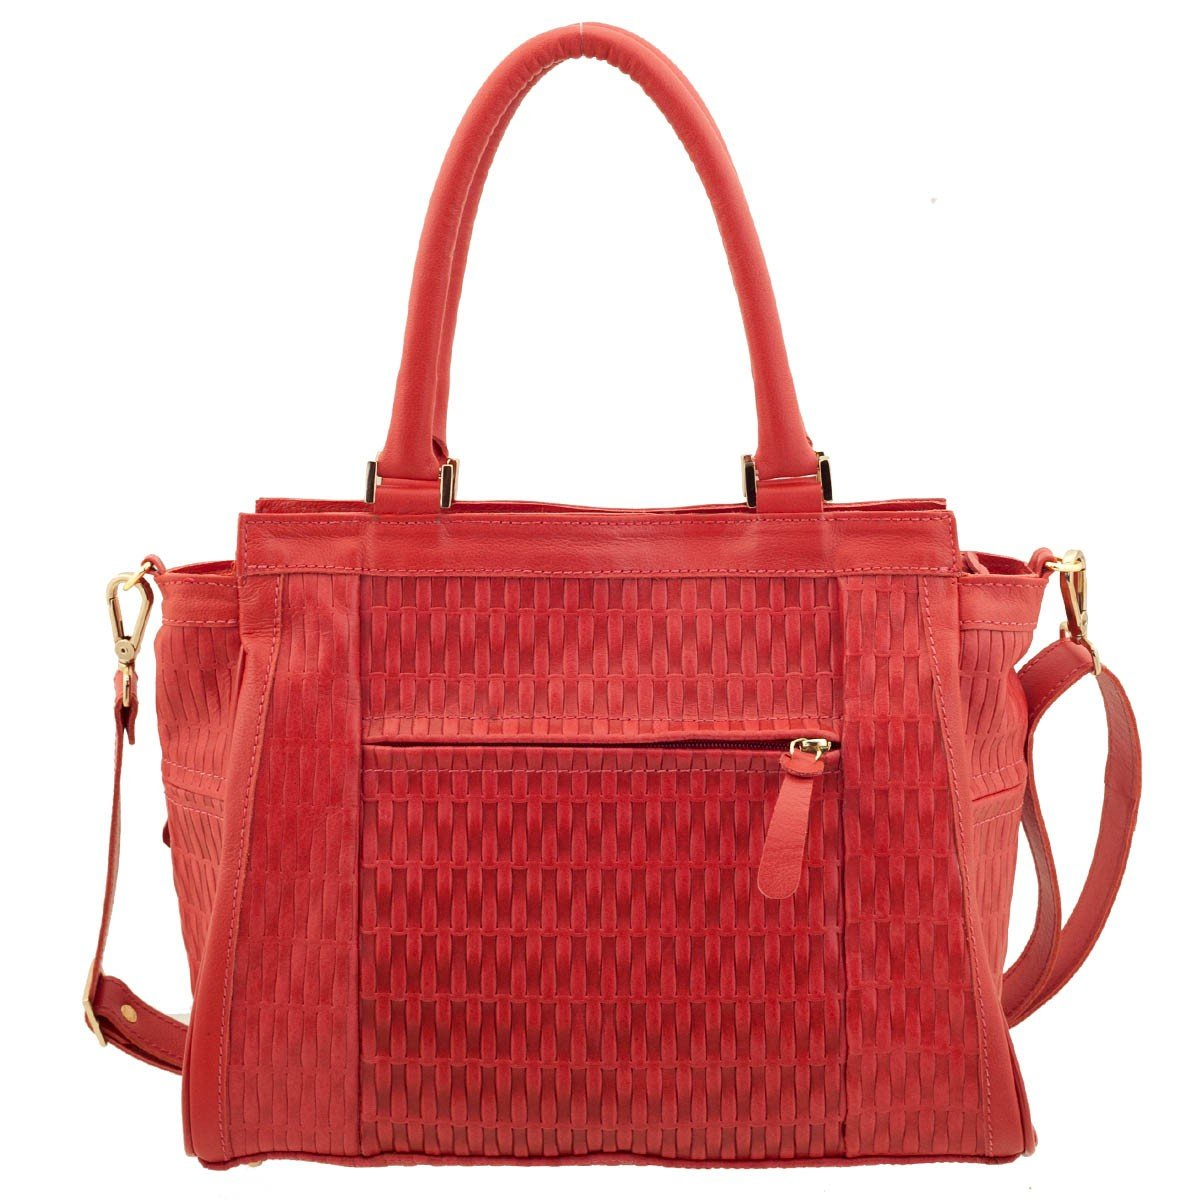 Bolsa Feminina ARZON Vermelha